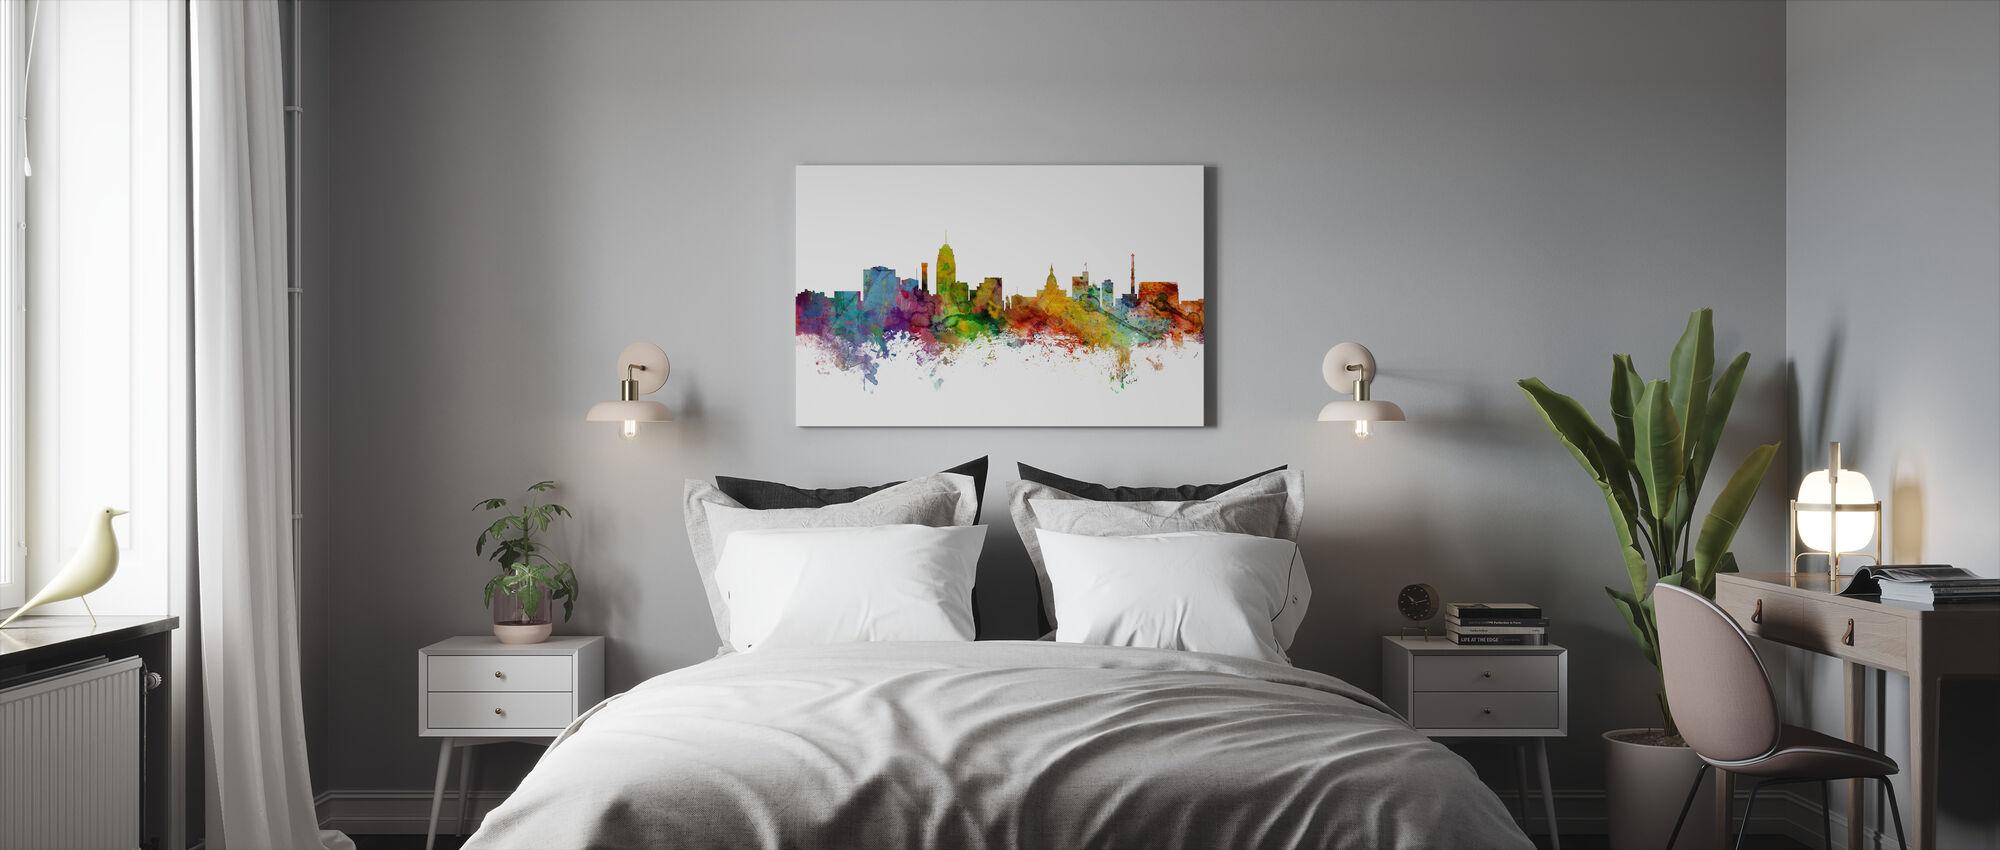 Skyline van Lansing Michigan - Canvas print - Slaapkamer